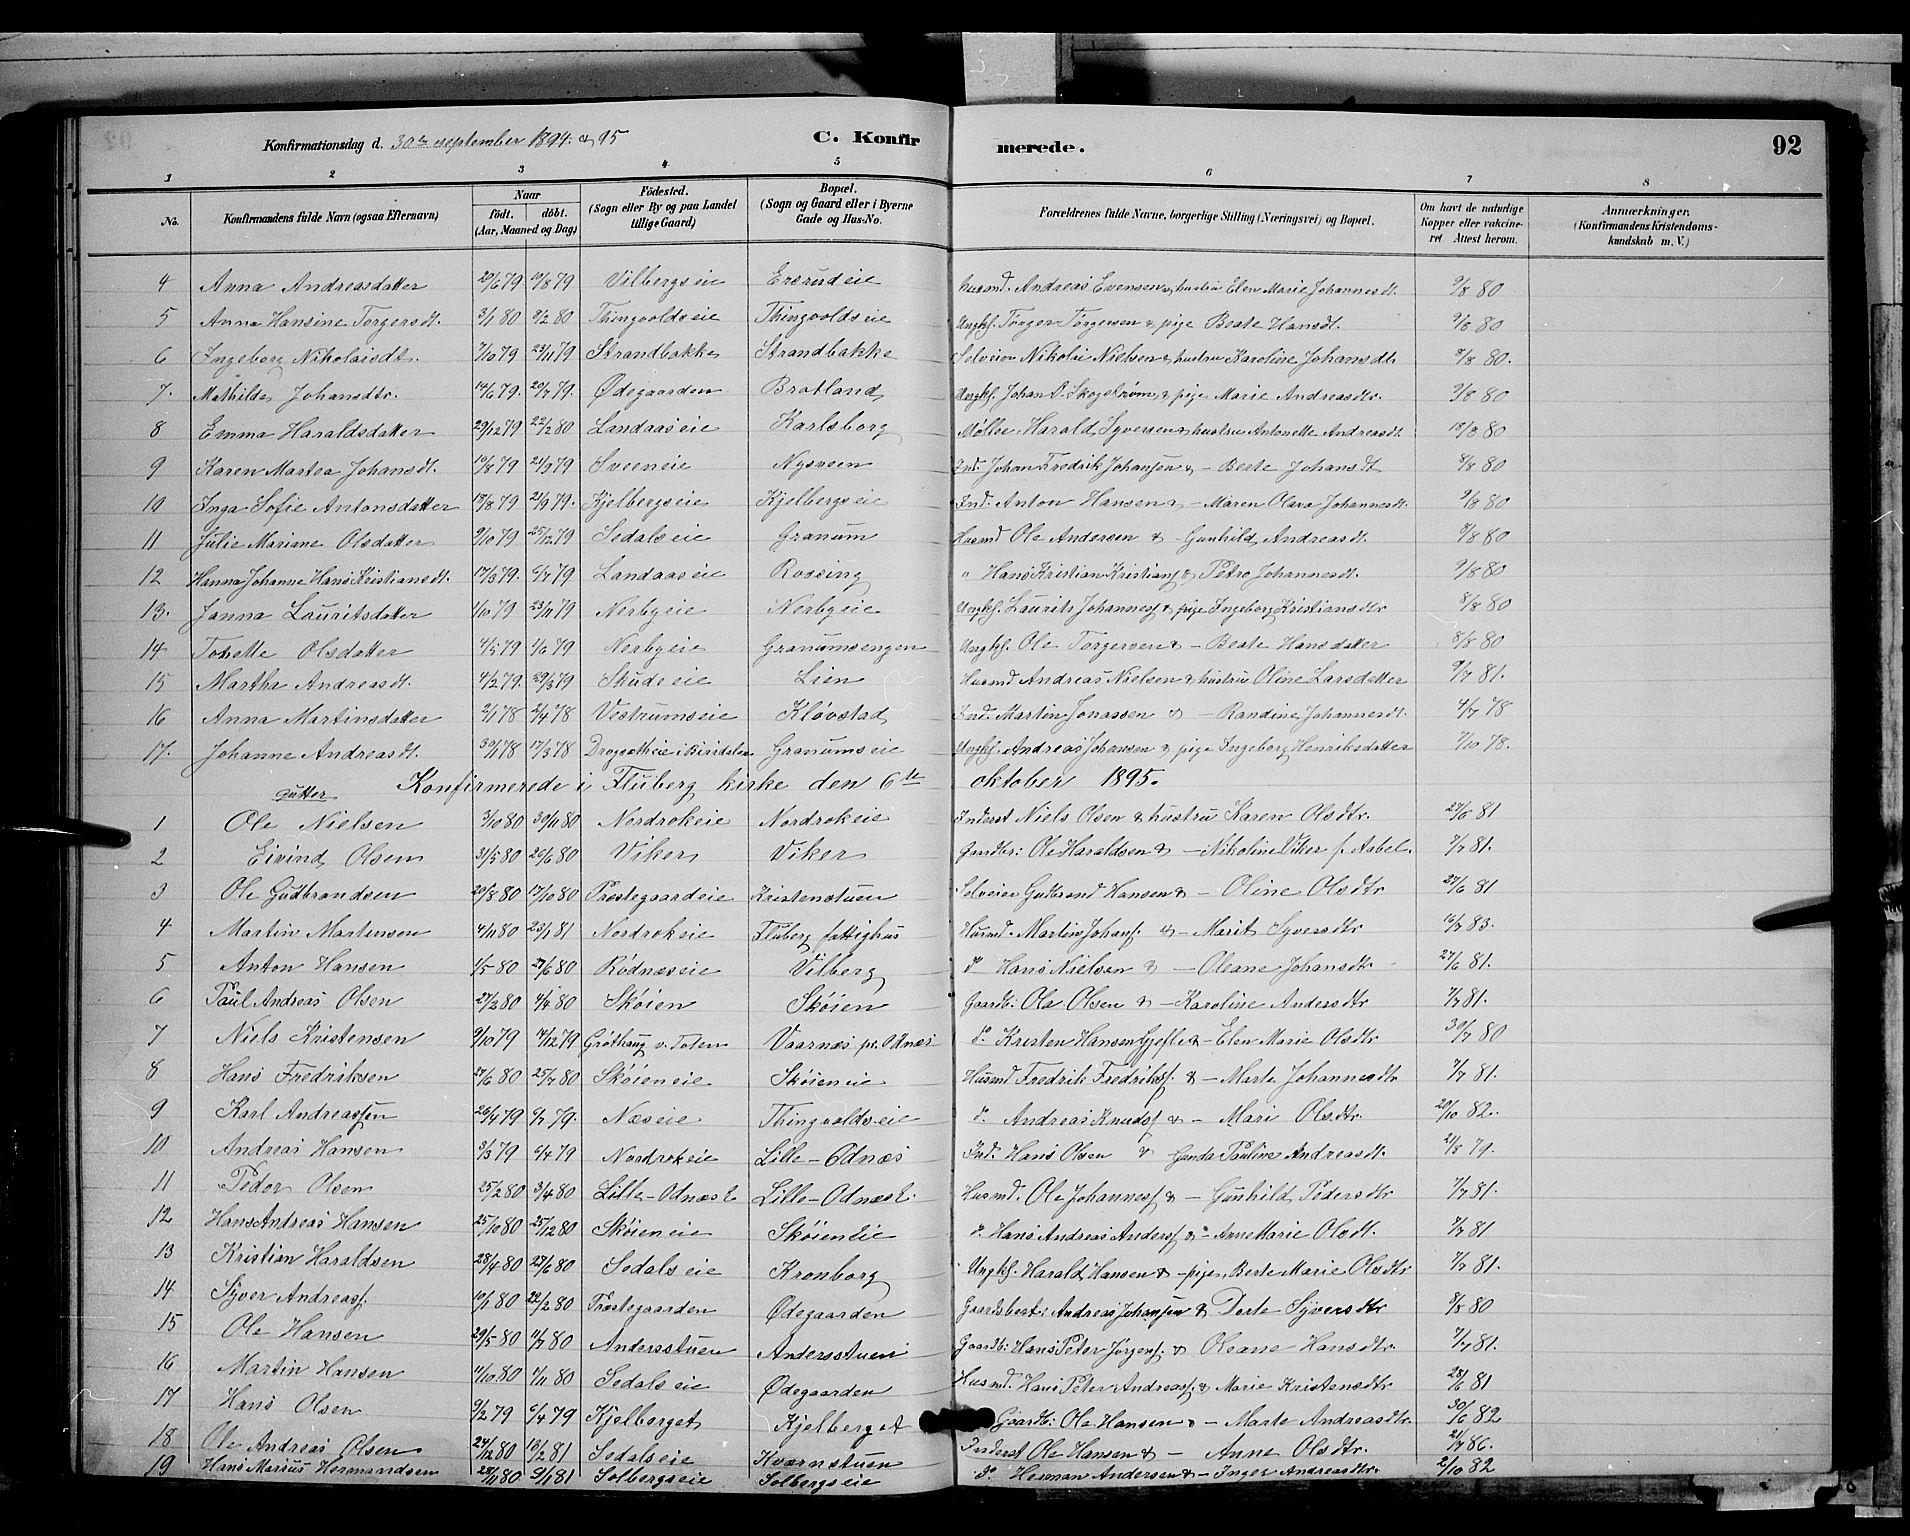 SAH, Søndre Land prestekontor, L/L0003: Klokkerbok nr. 3, 1884-1902, s. 92